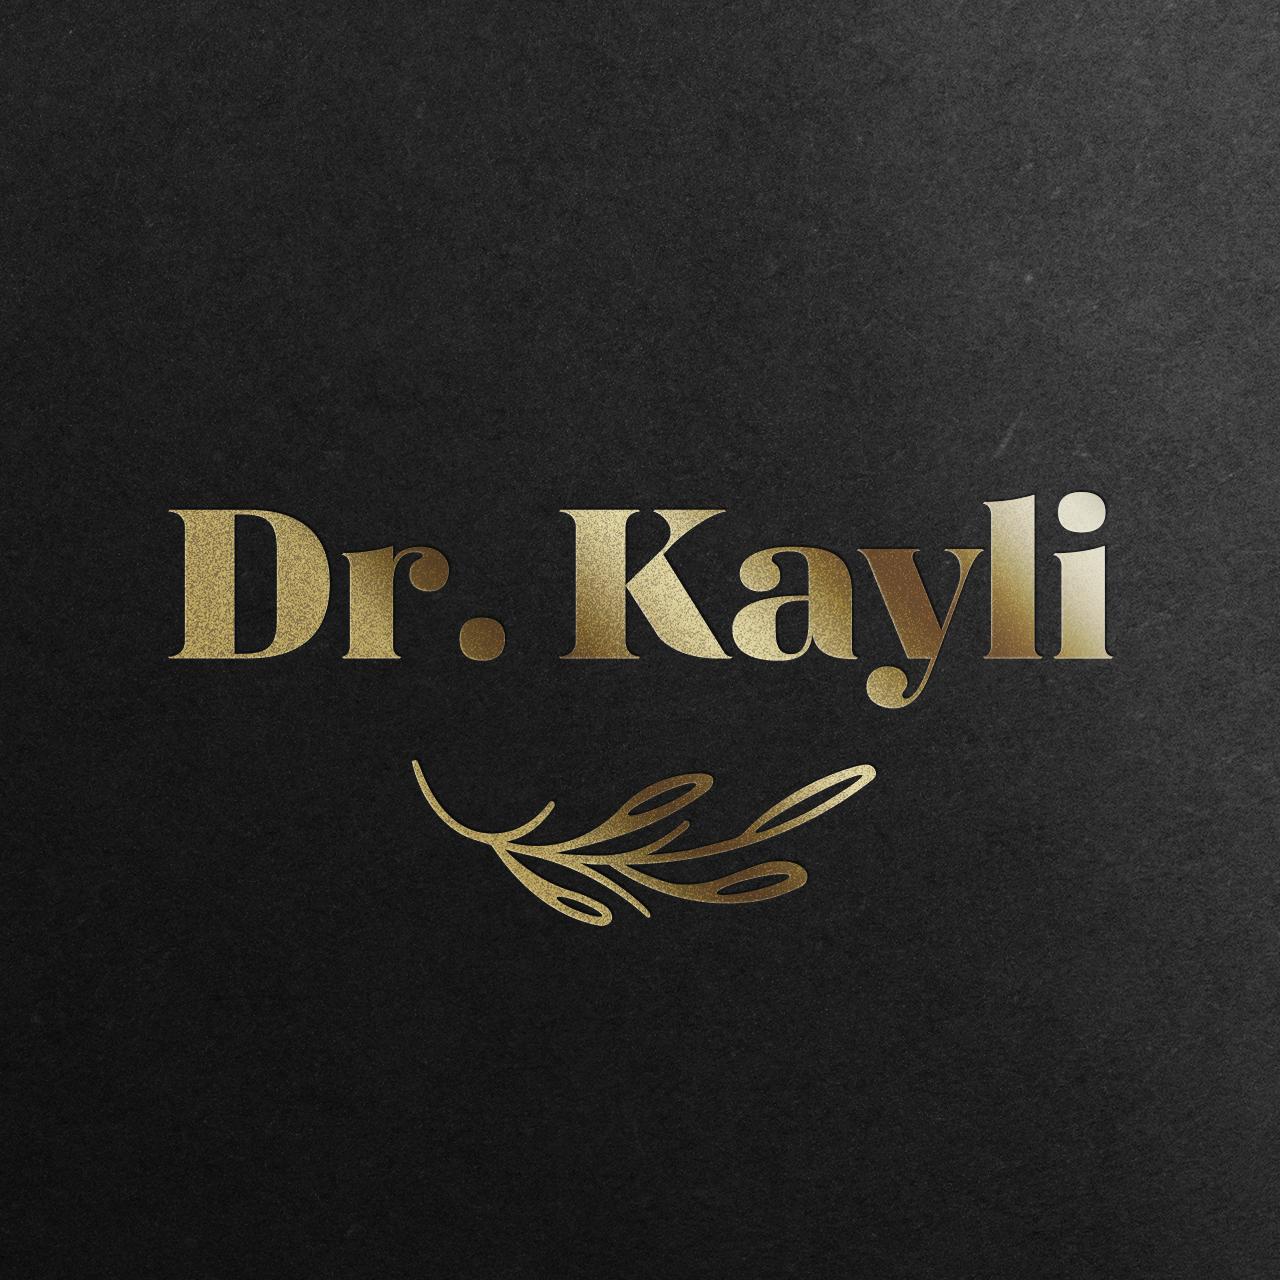 dr kayli-logo-mockup-gold